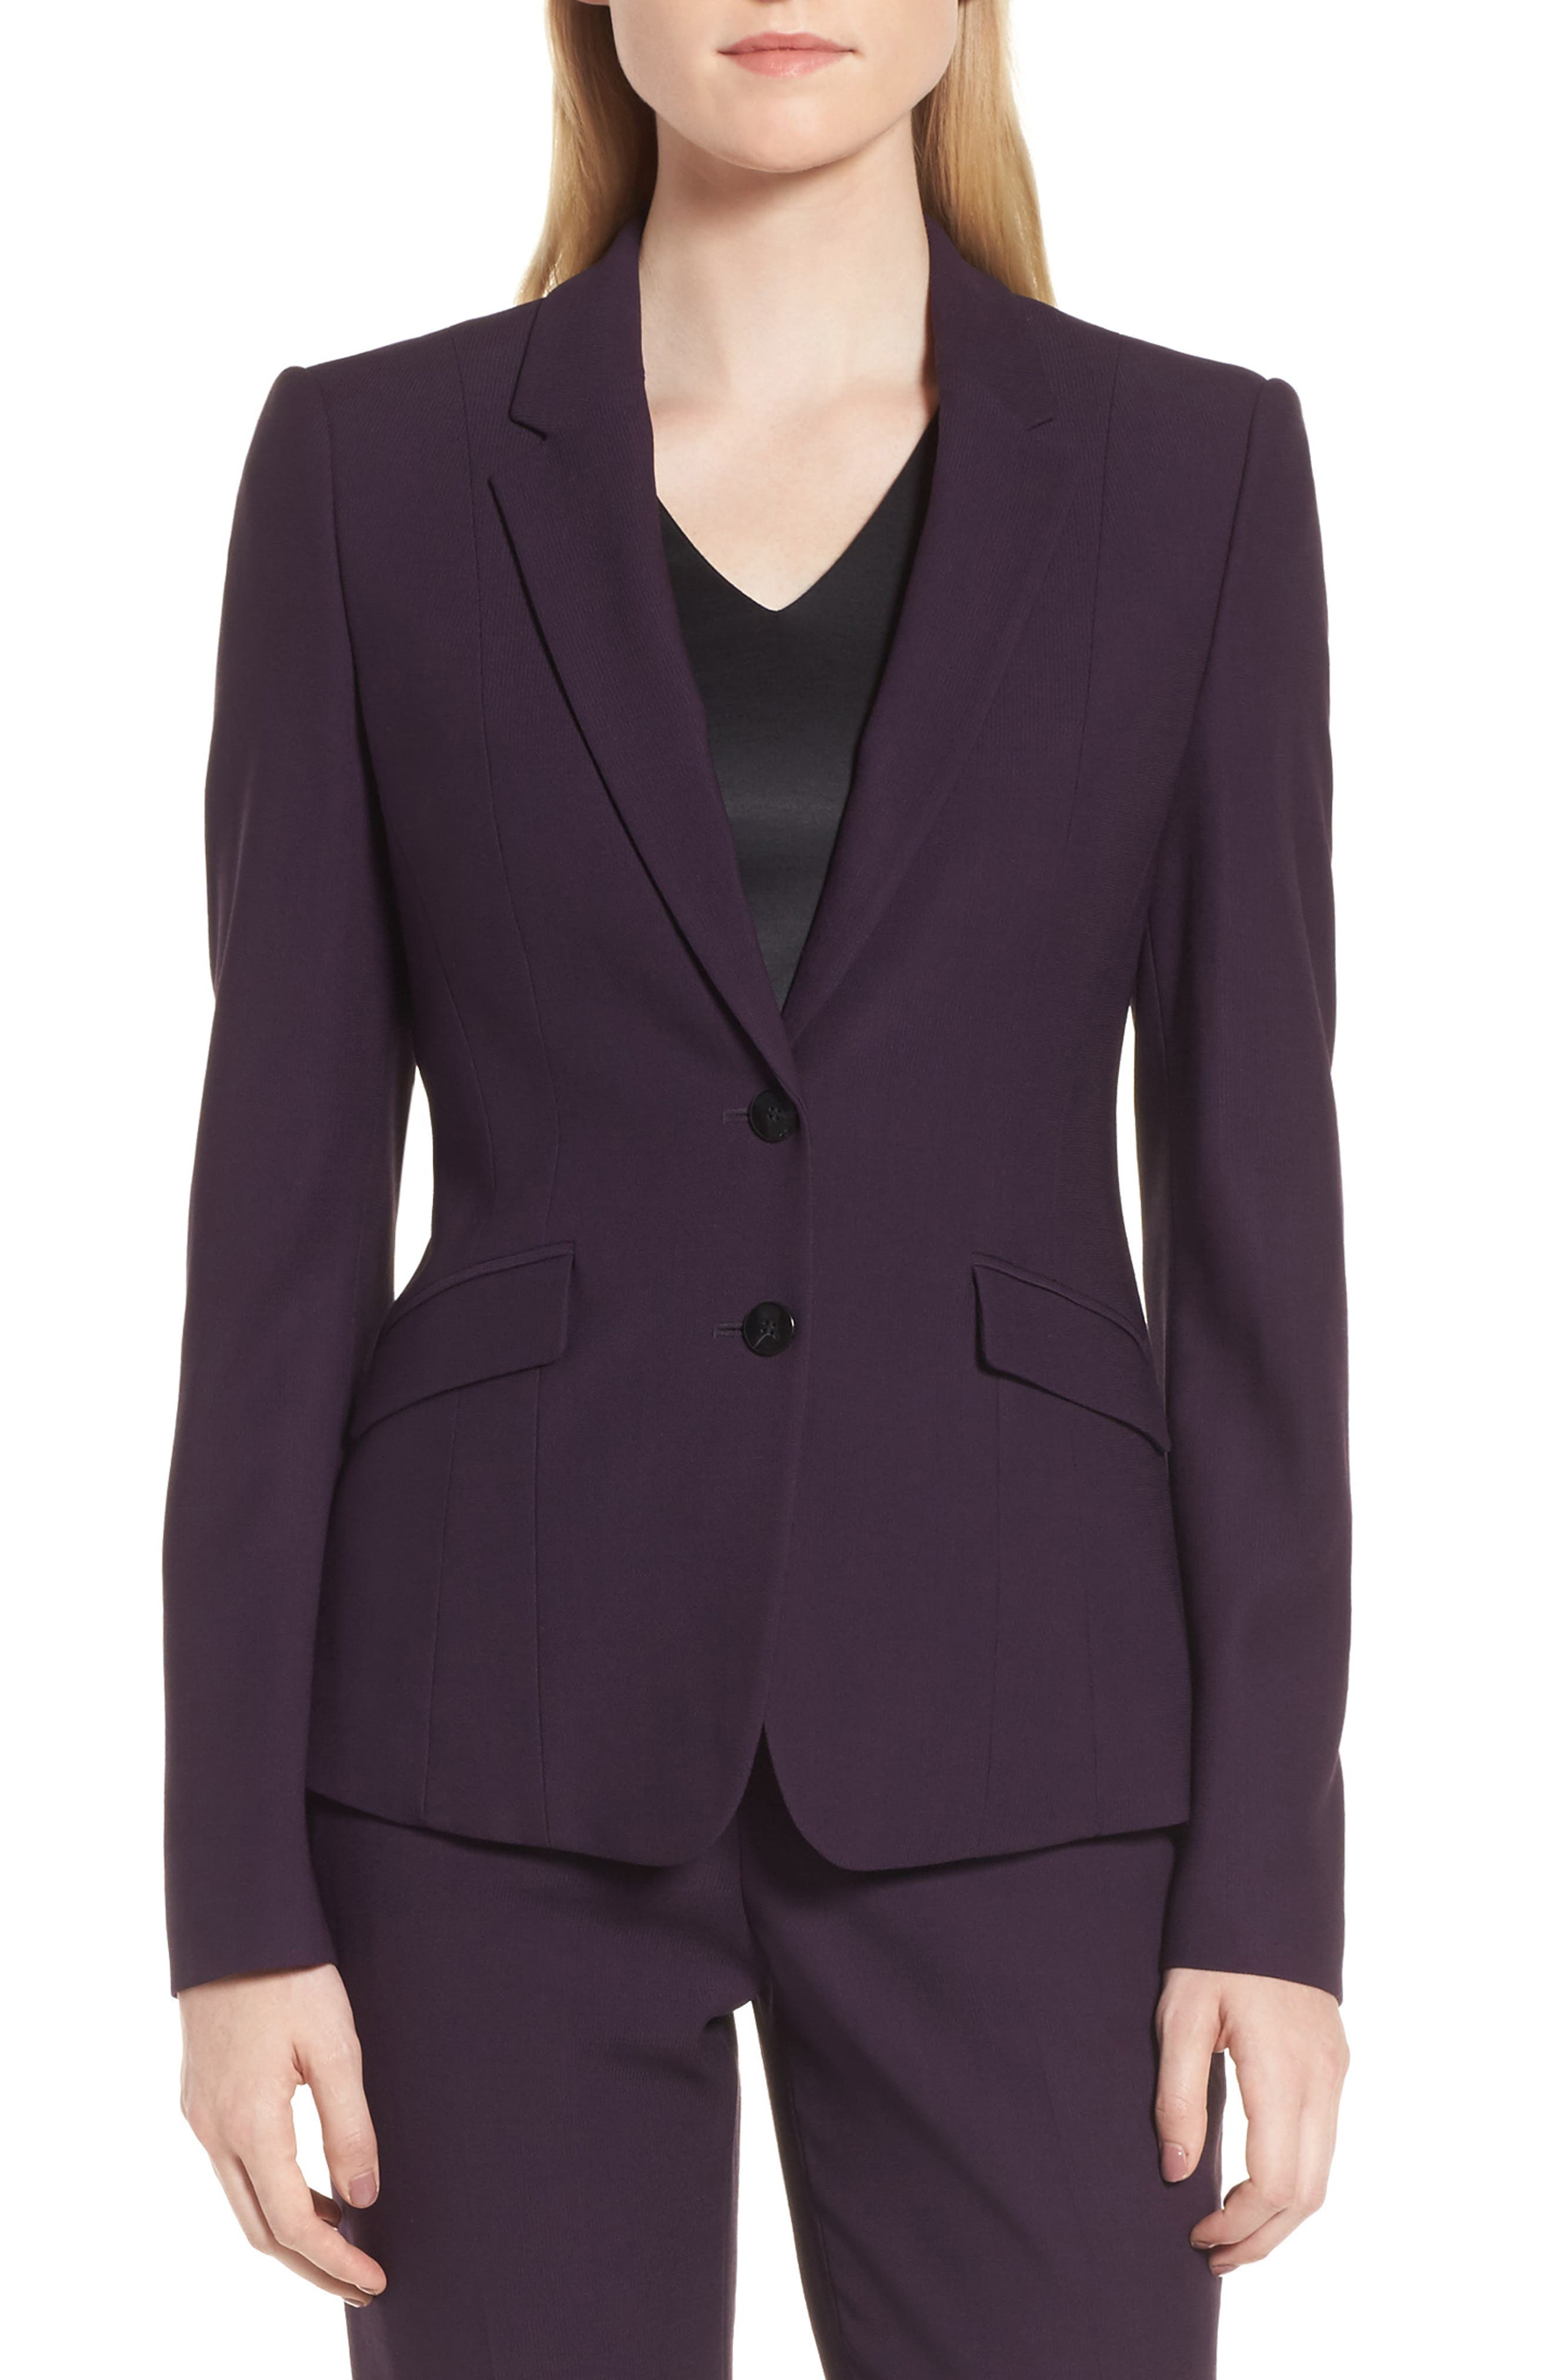 Main Image - BOSS Jonalua Stretch Wool Suit Jacket (Regular & Petite)